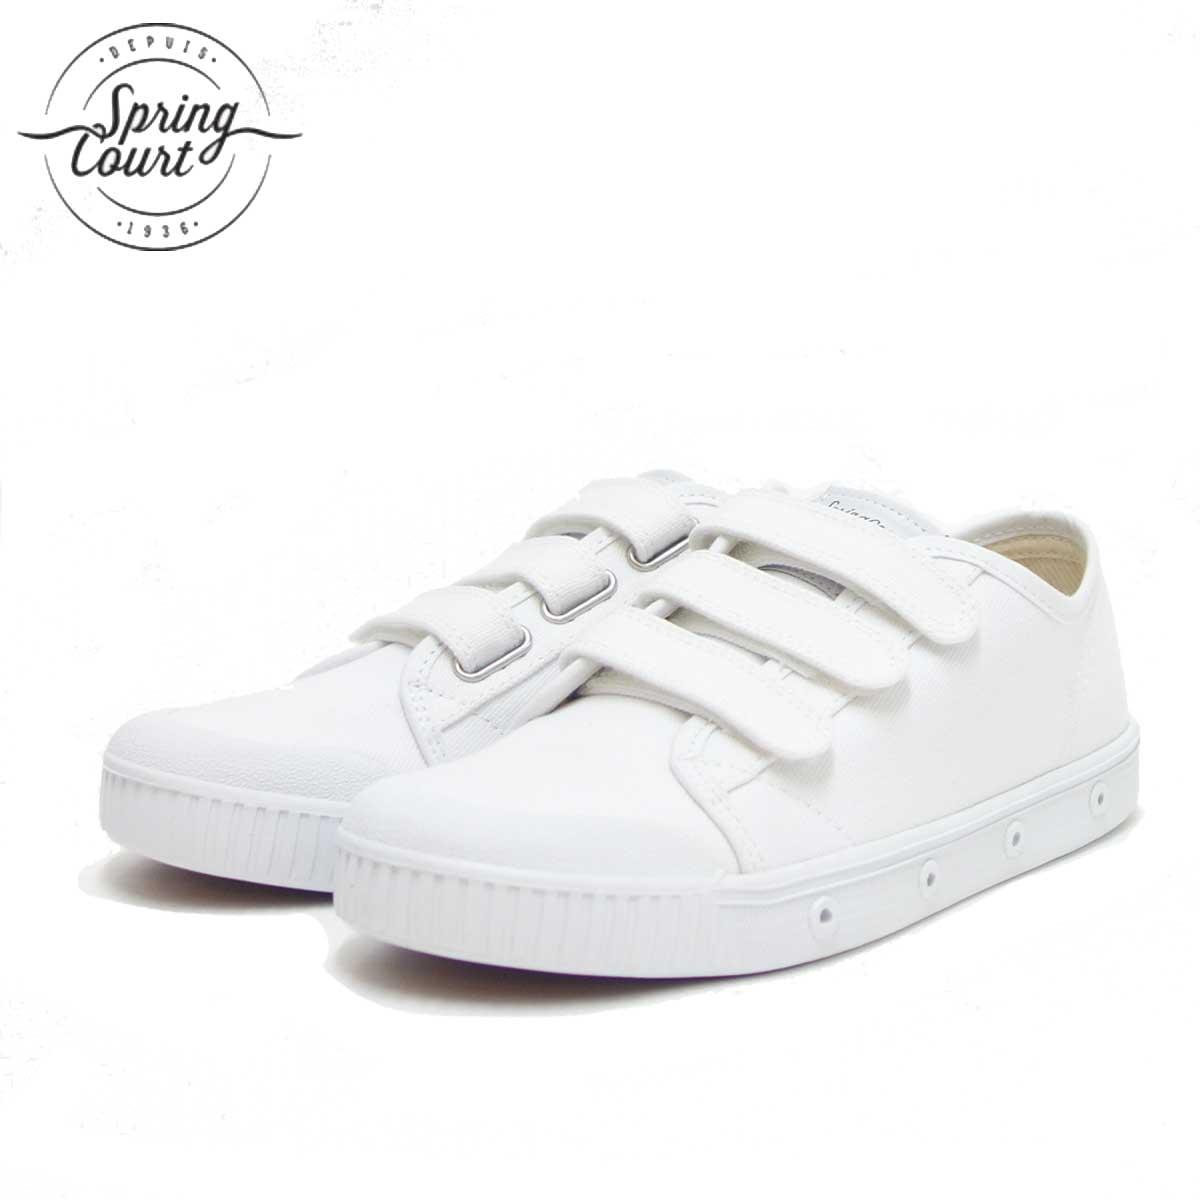 Spring Court スプリングコート G2SV-V1(レディース)VELCRO CANVAS WHITE キャンバス地のベルクロスニーカー 「靴」